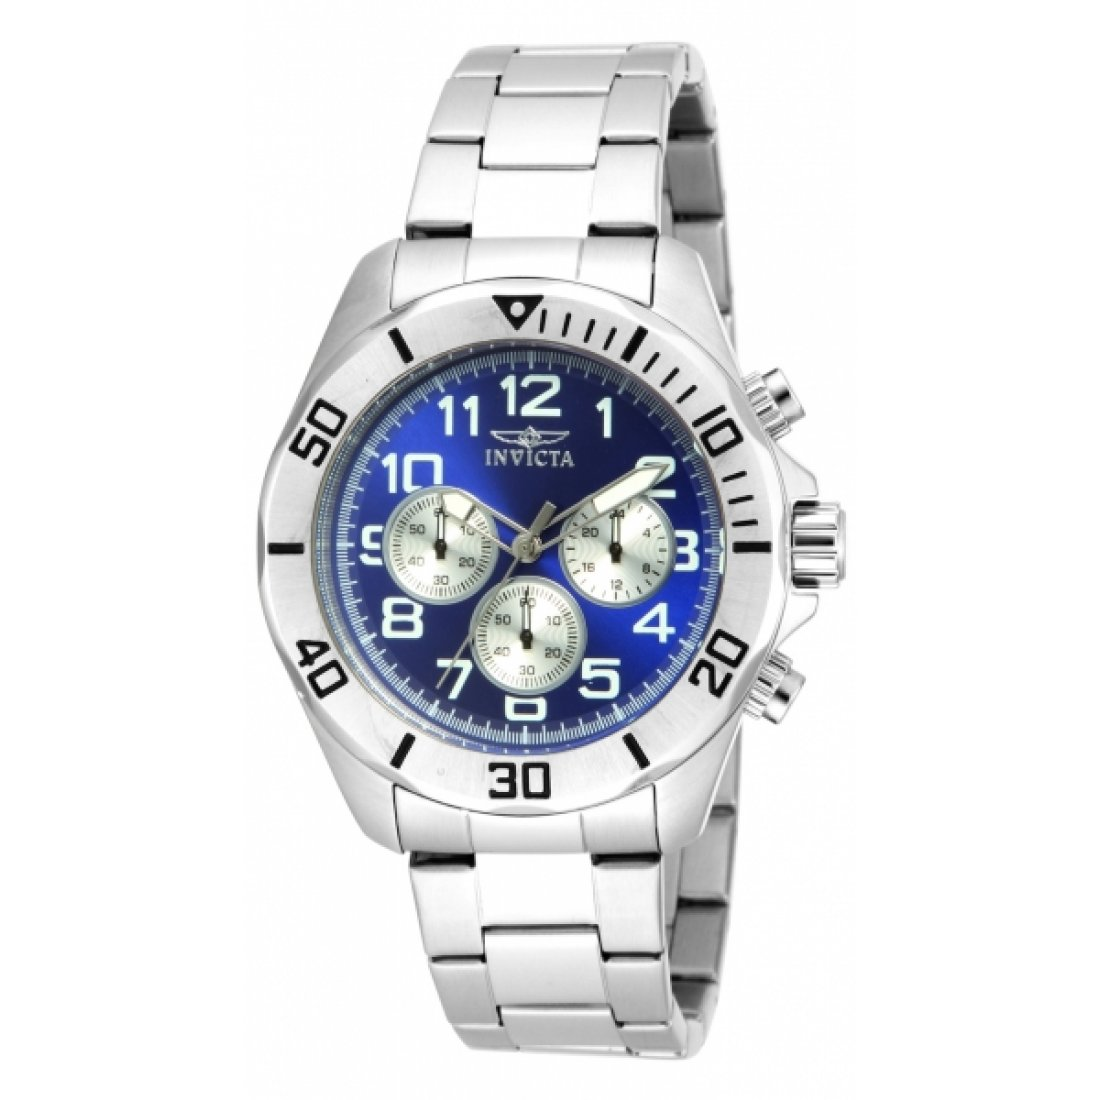 Invicta Pro Diver 17937 Anny van Buul Juweliers Horloges